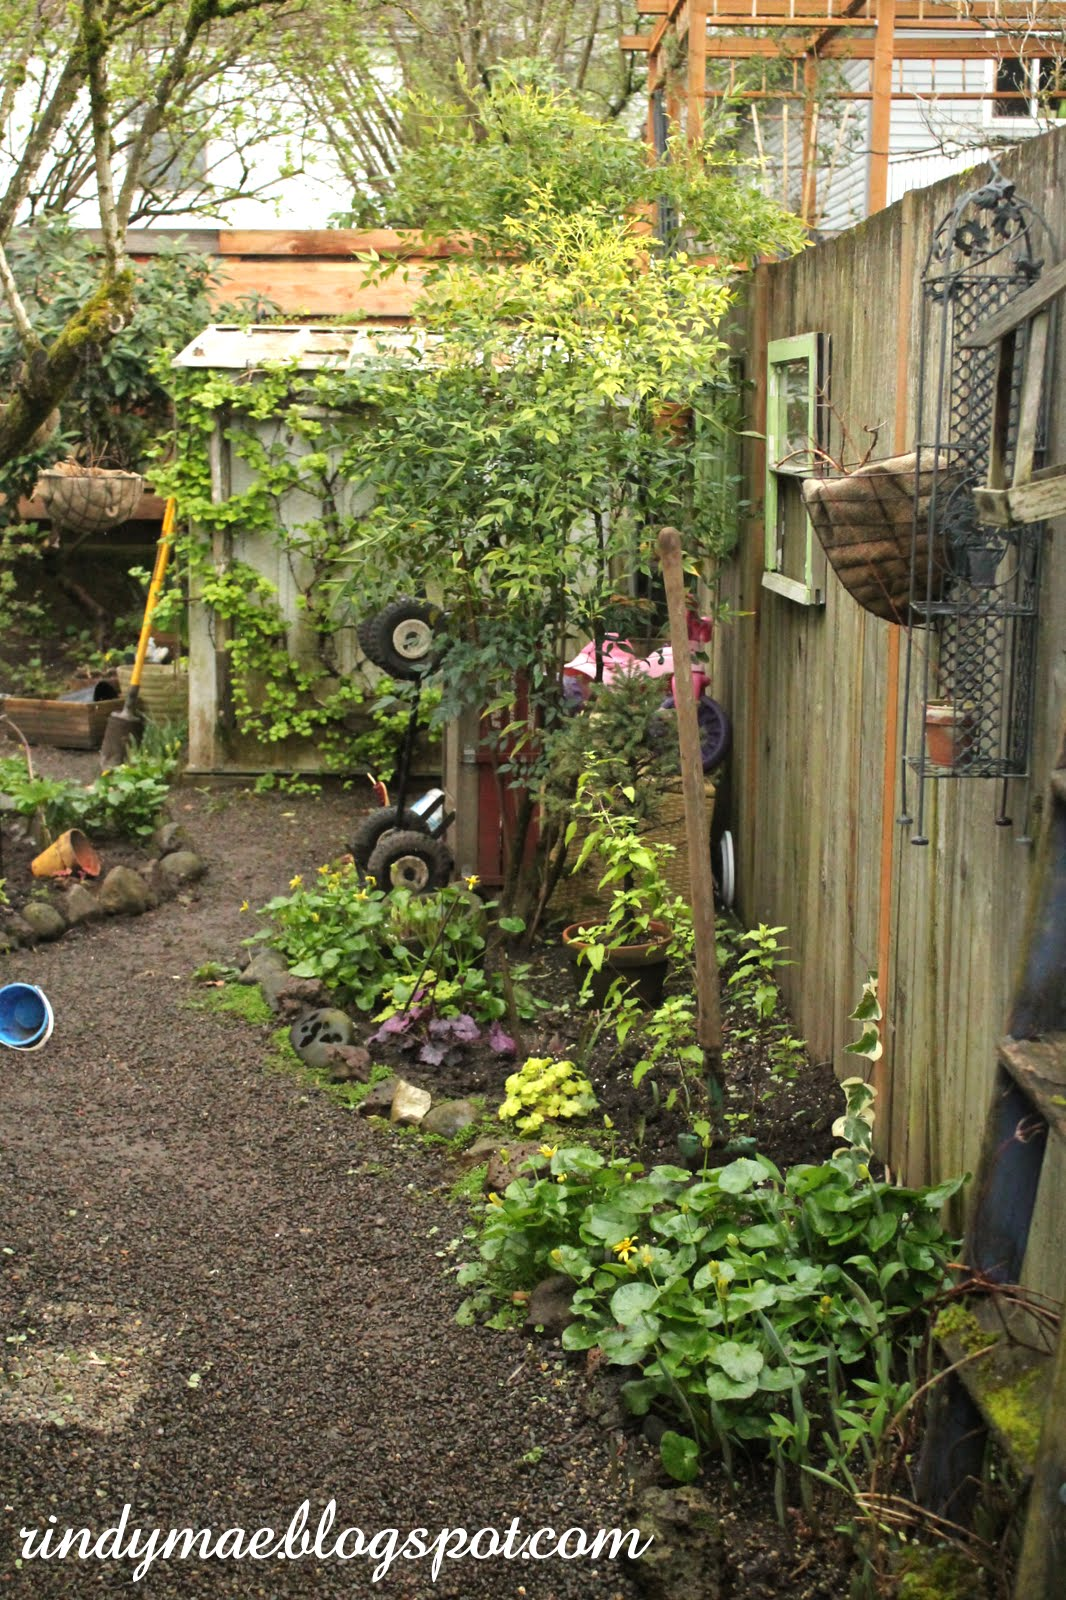 rindy mae the backyard 3 20 16